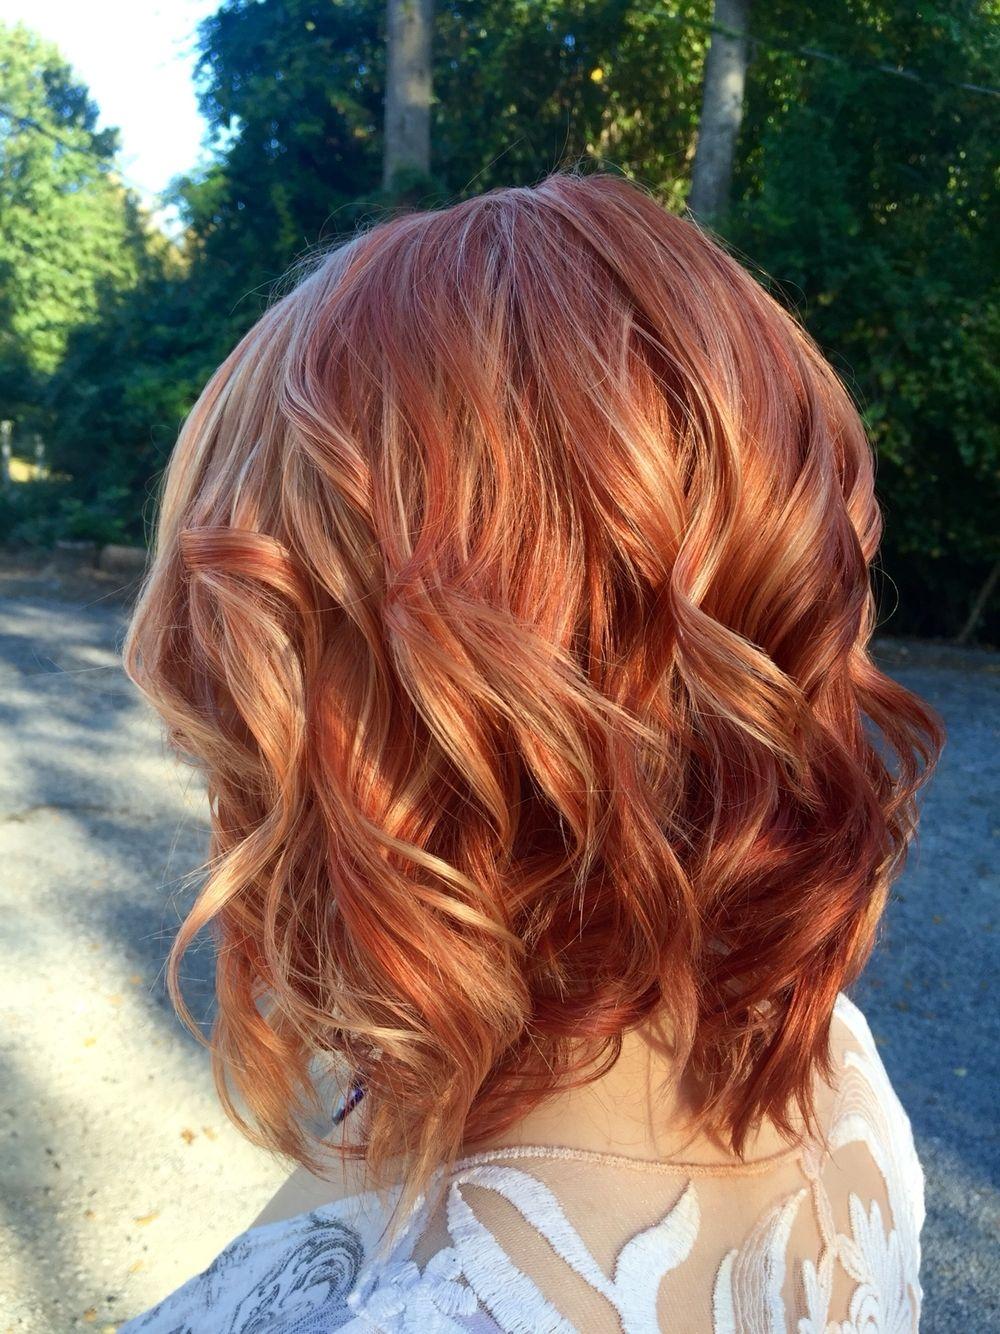 Pin by sarah doerrer on hair love in pinterest hair hair